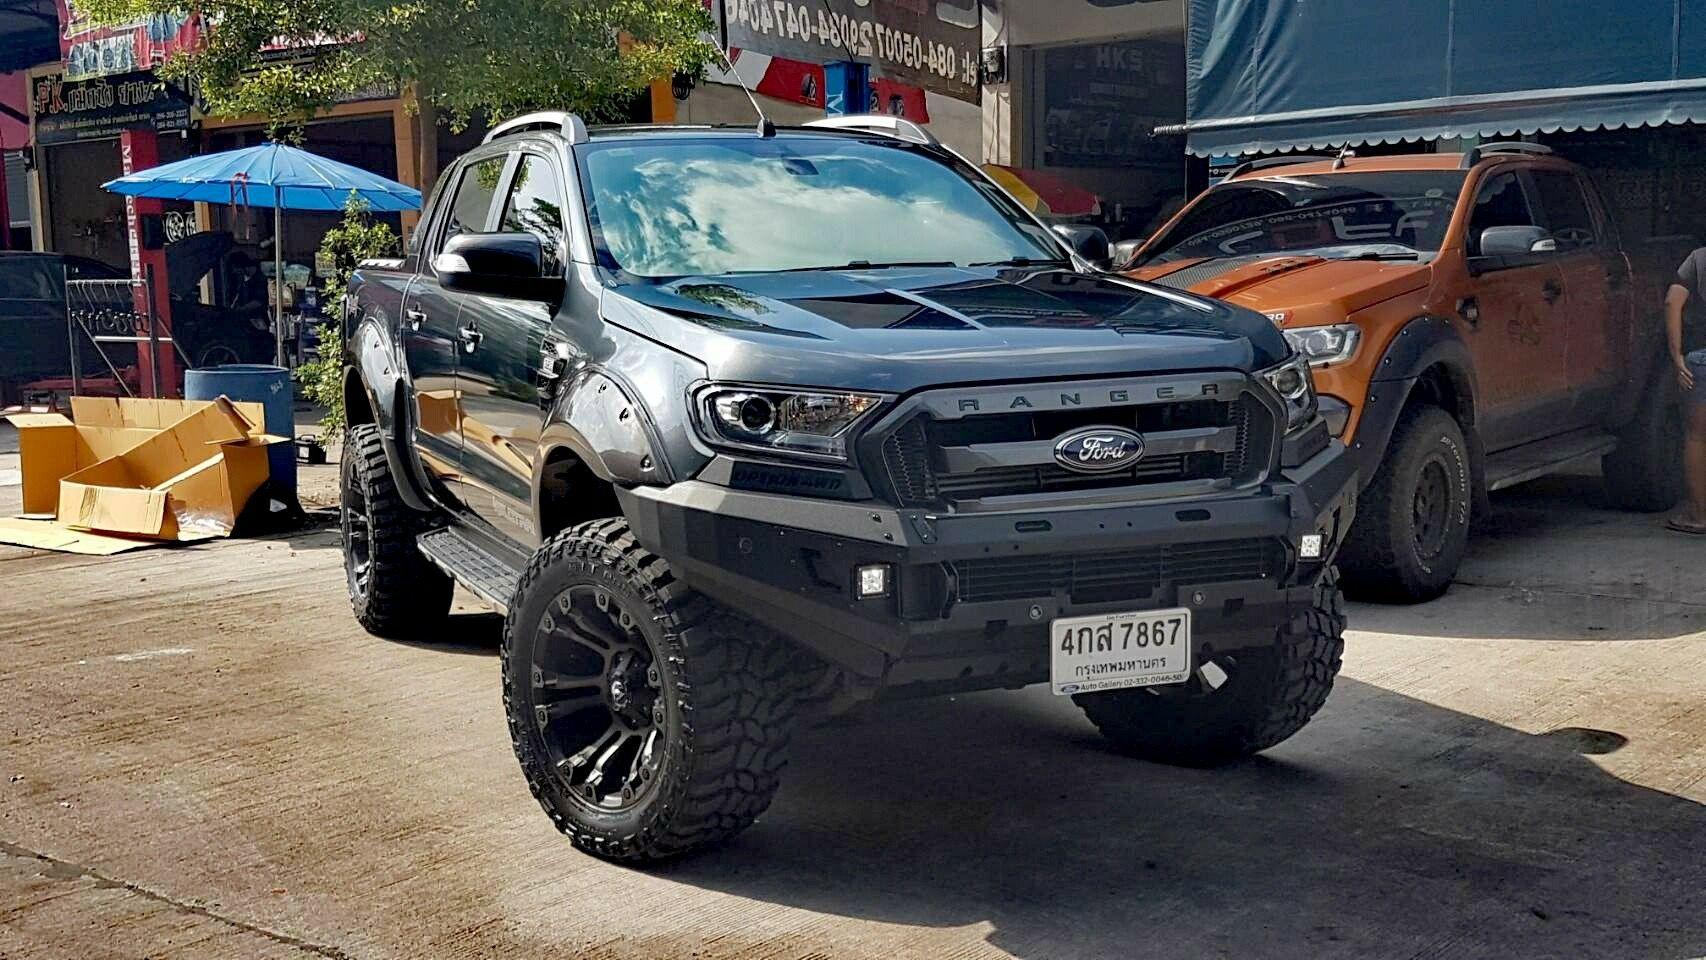 Ranger Carros Legais Projetos De Carros Carros